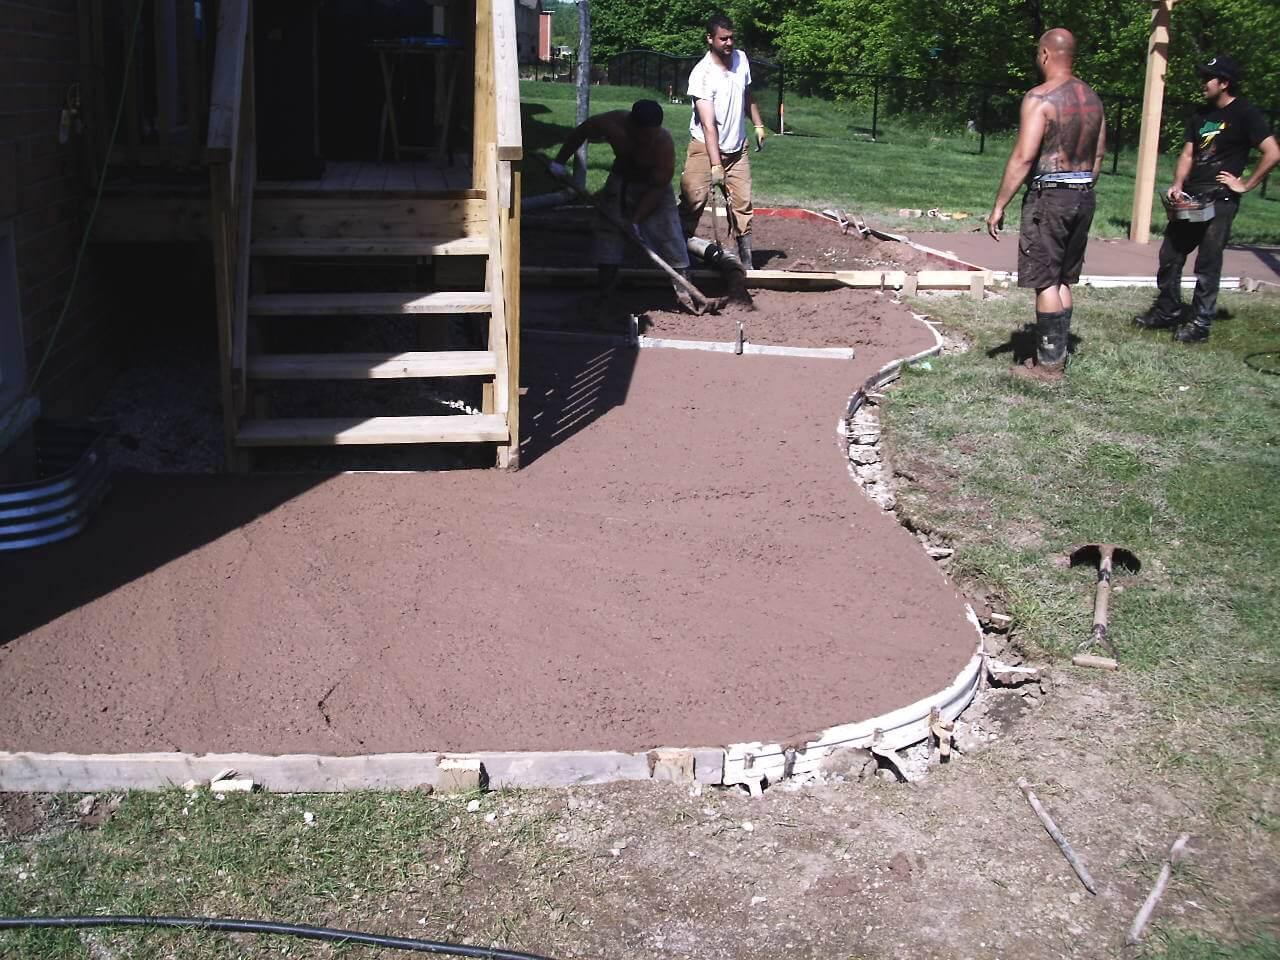 Decorative-Concrete-Construction-Contractor-Toronto-Pergola-Rd-5